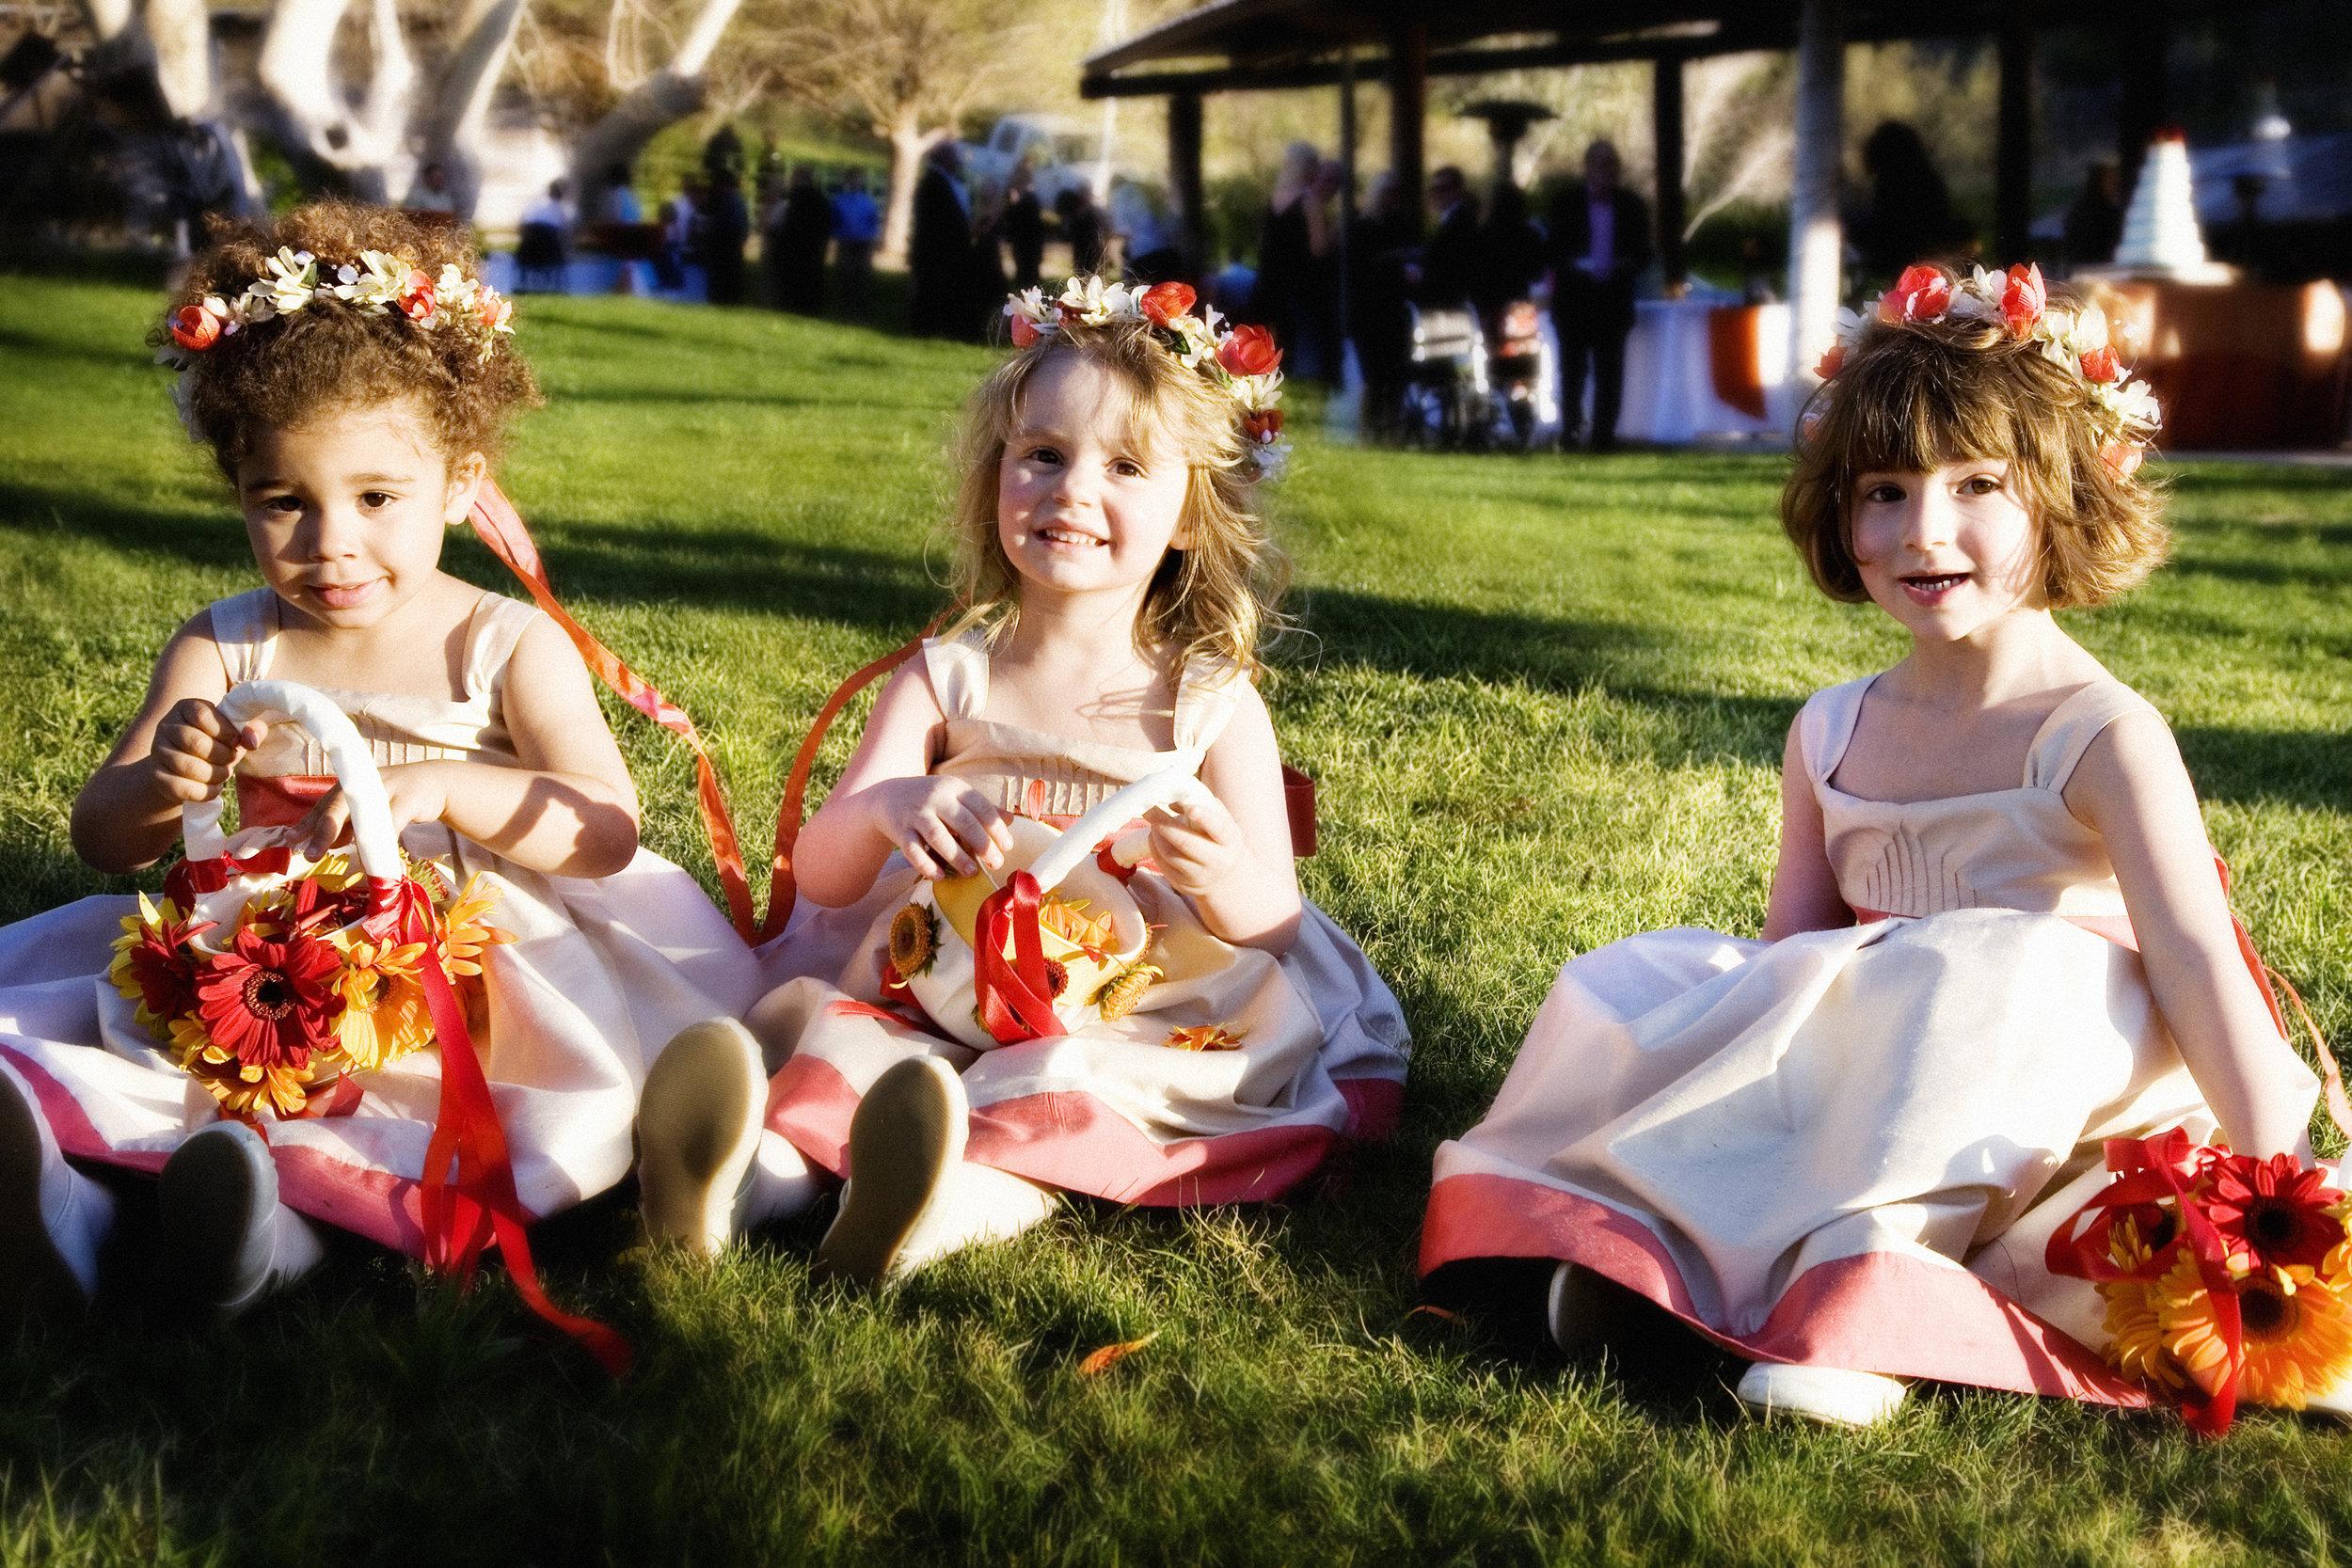 5 flower girls spring flower girl outfits flower crowns for flower girls spring wedding outdoor wedding Jane Jordan Photography Life Design Event.jpg